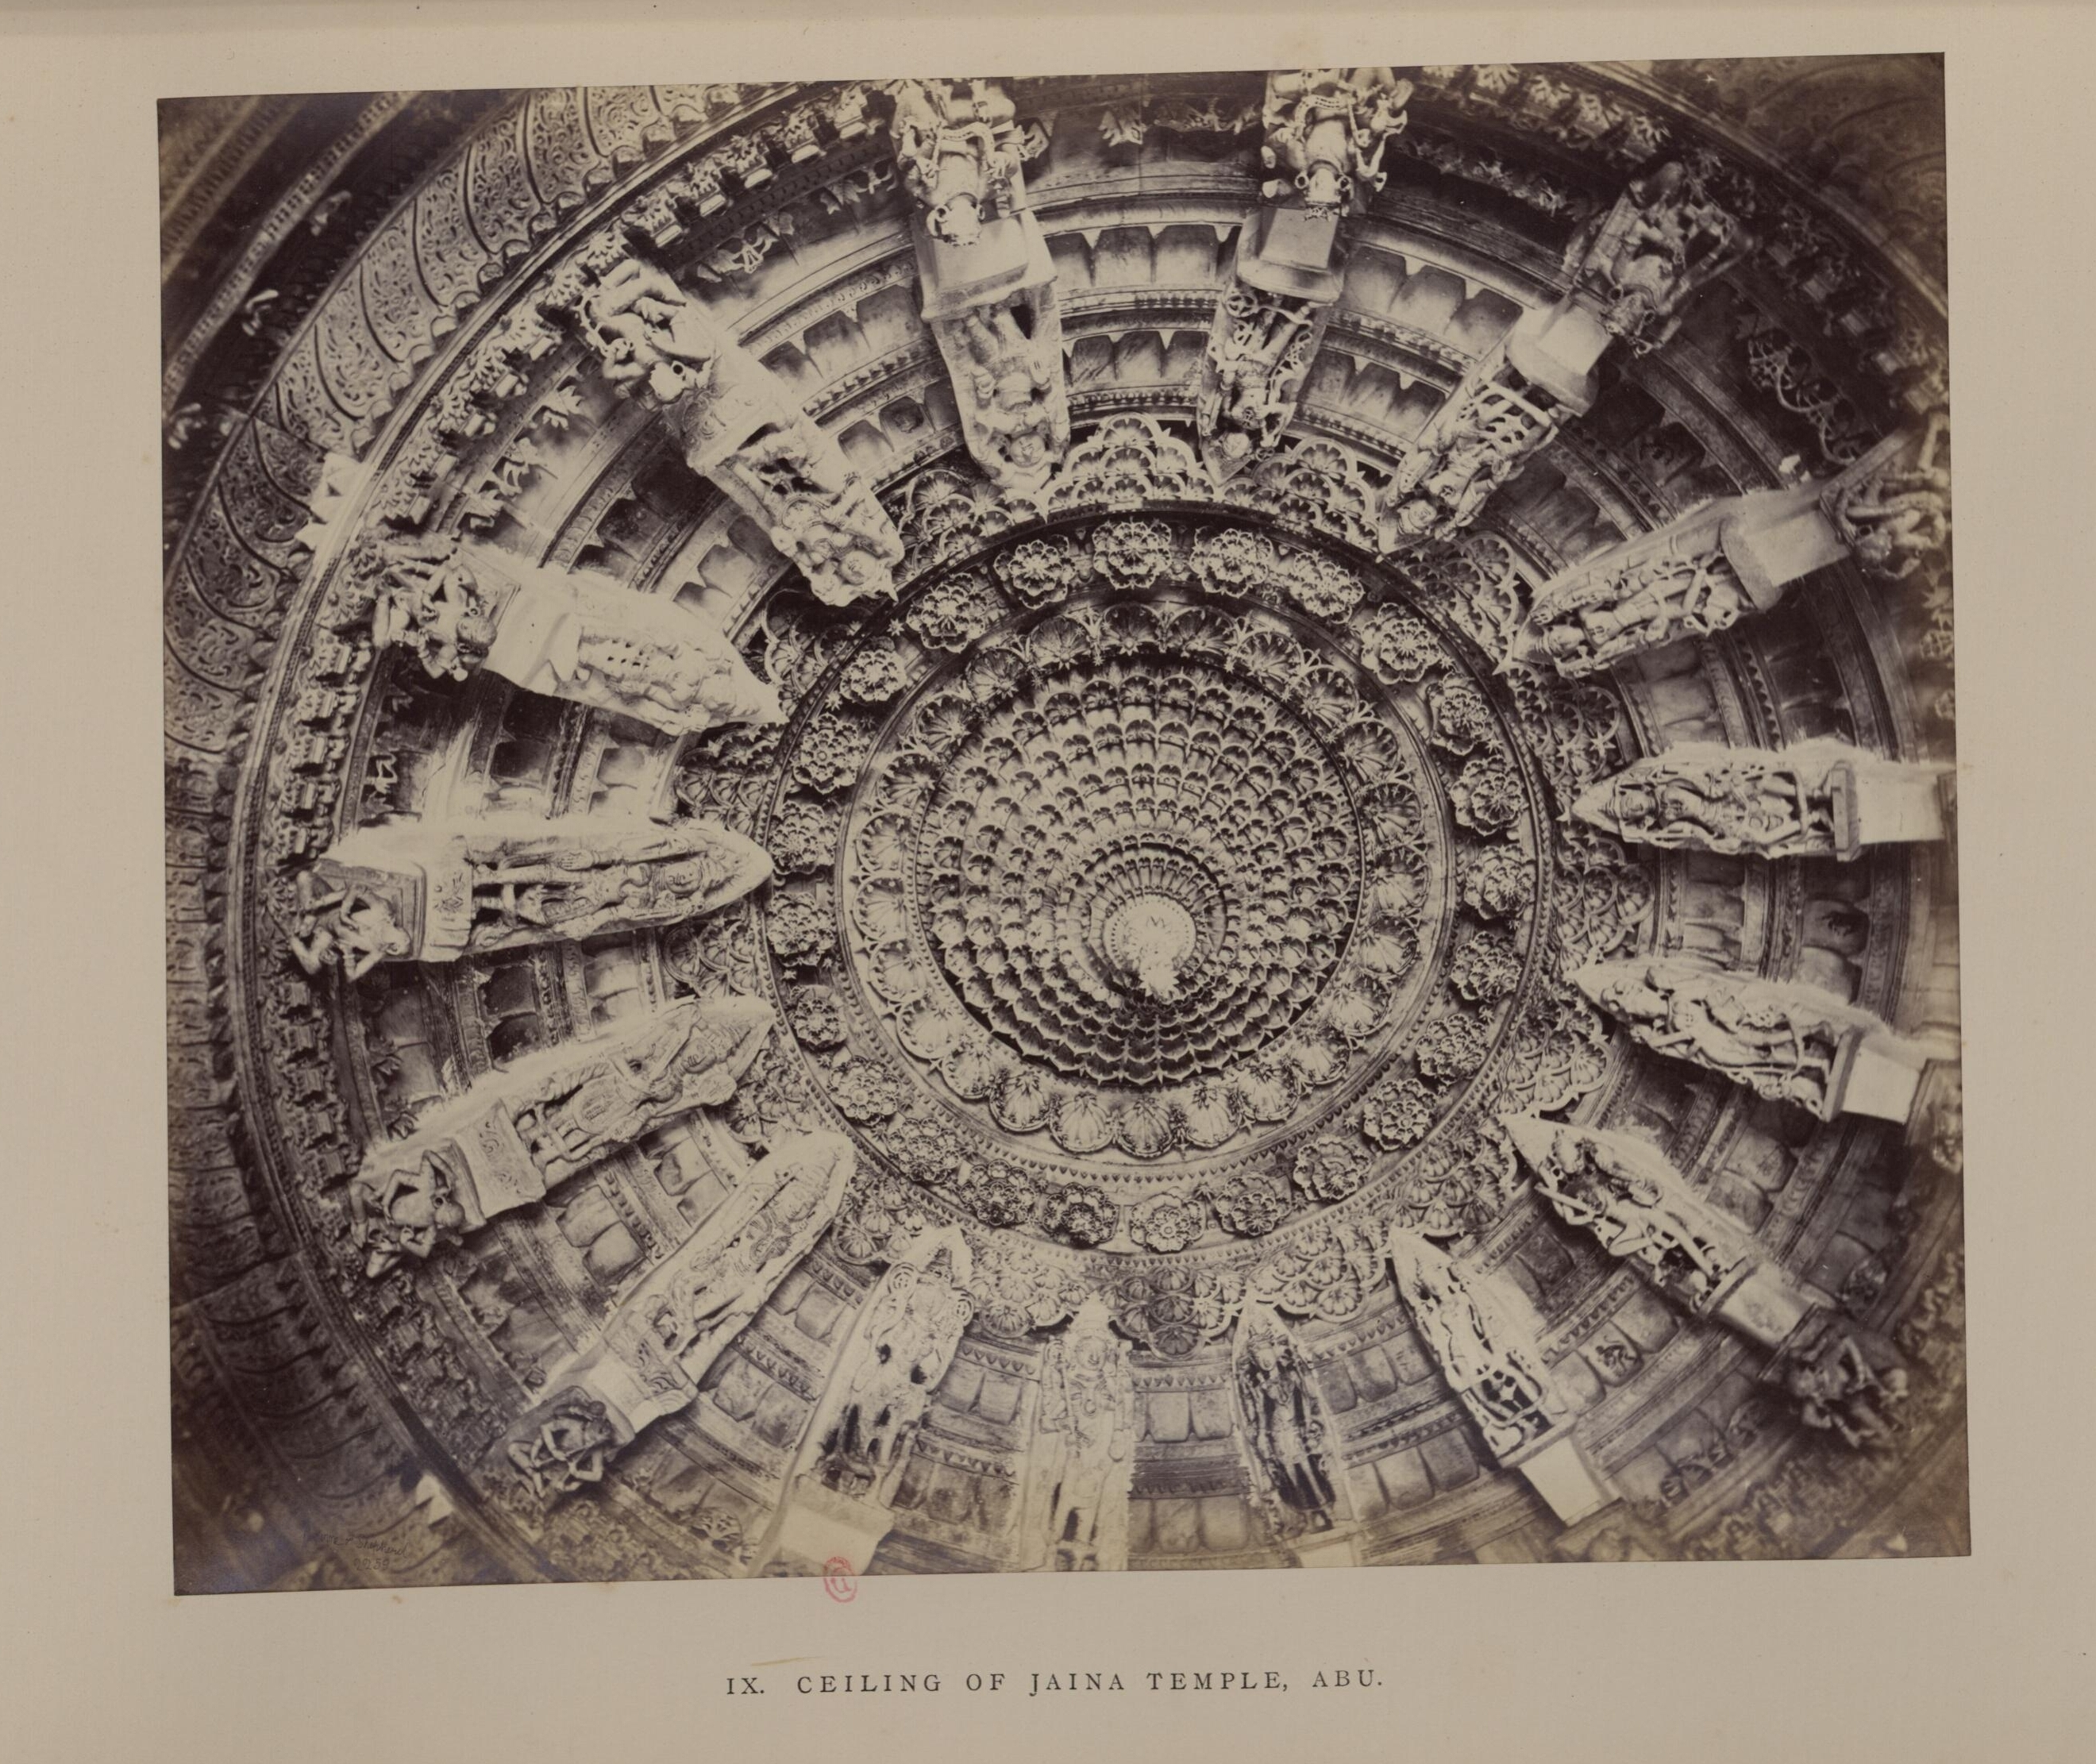 Маунт-Абу. Джайнский храм. Потолок